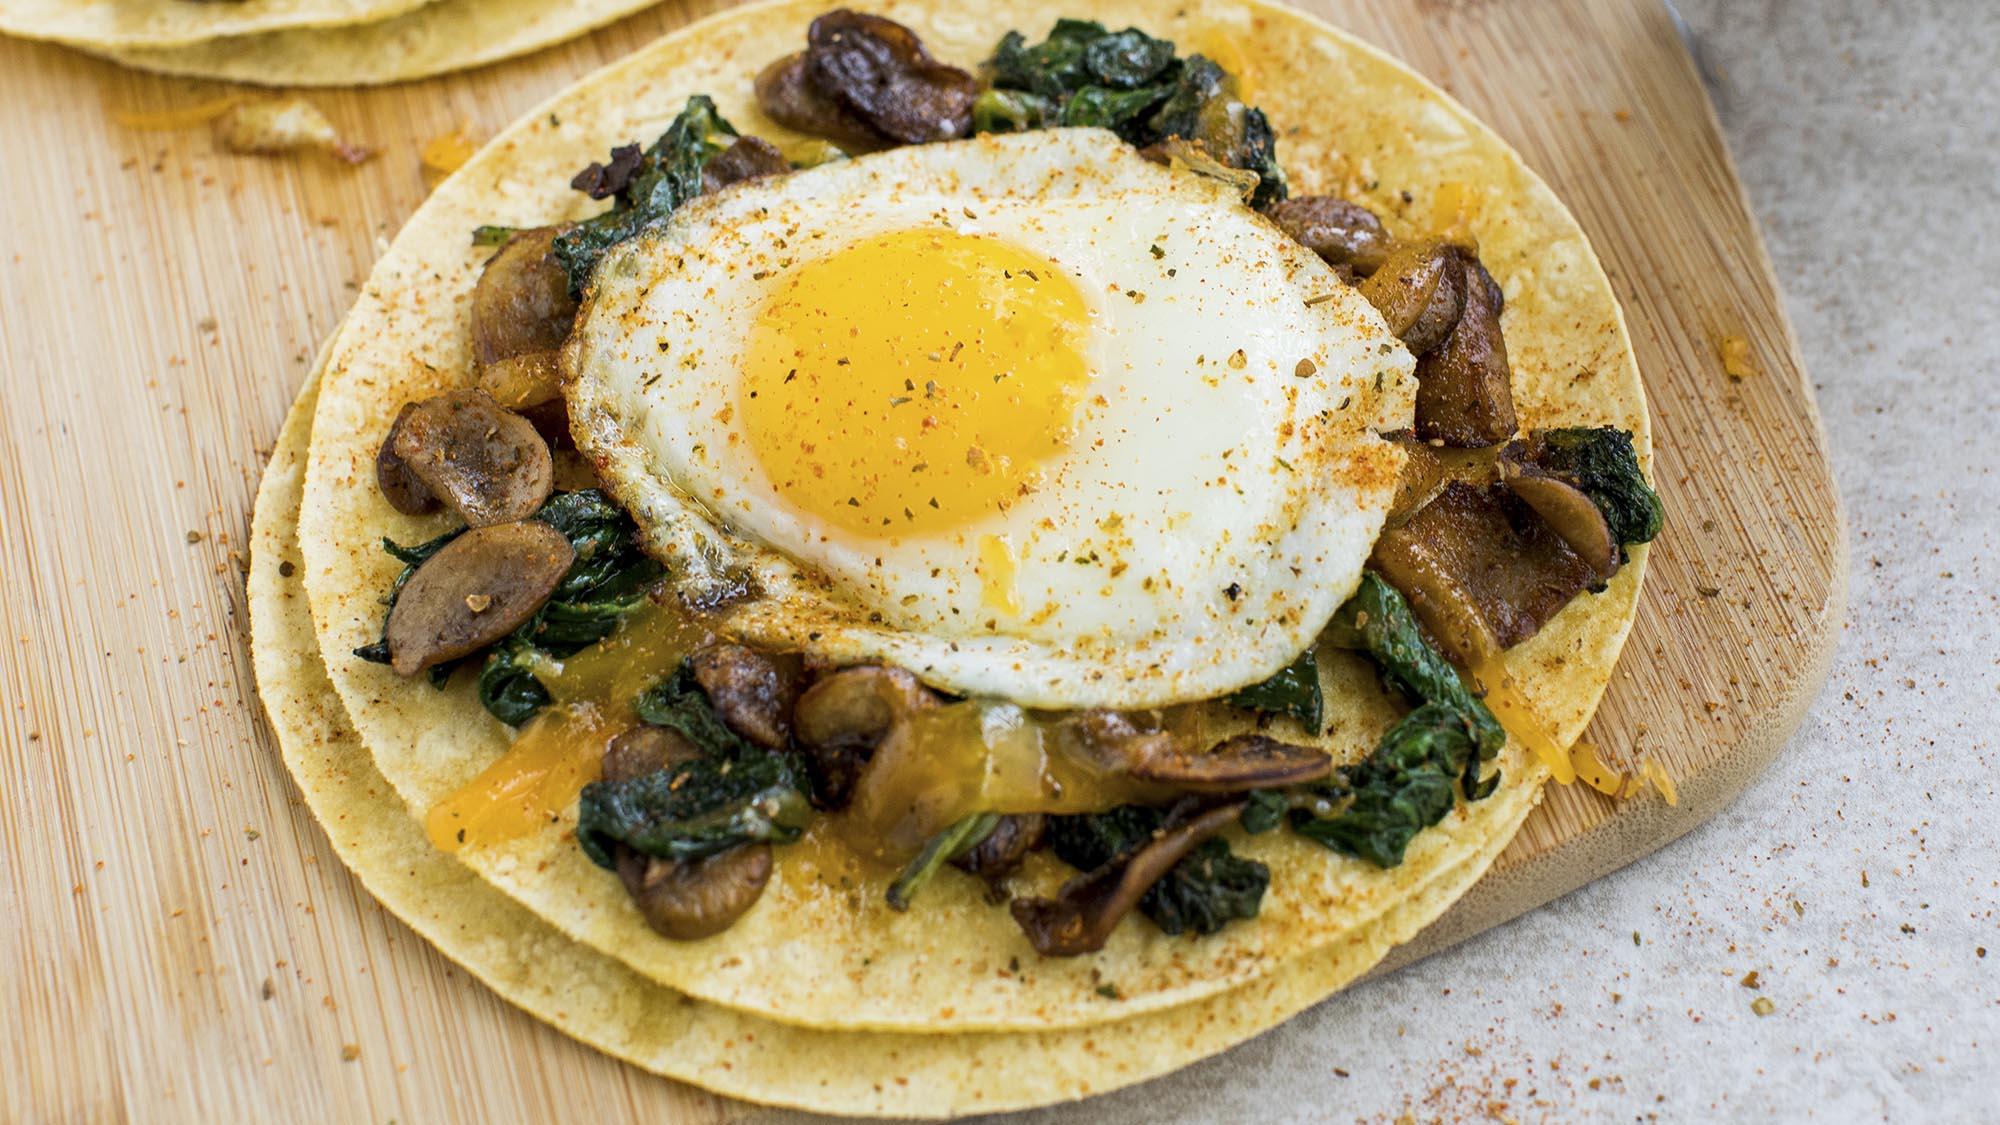 garden_herb_veggie_and_egg_breakfast_tacos_2000x1125.jpg